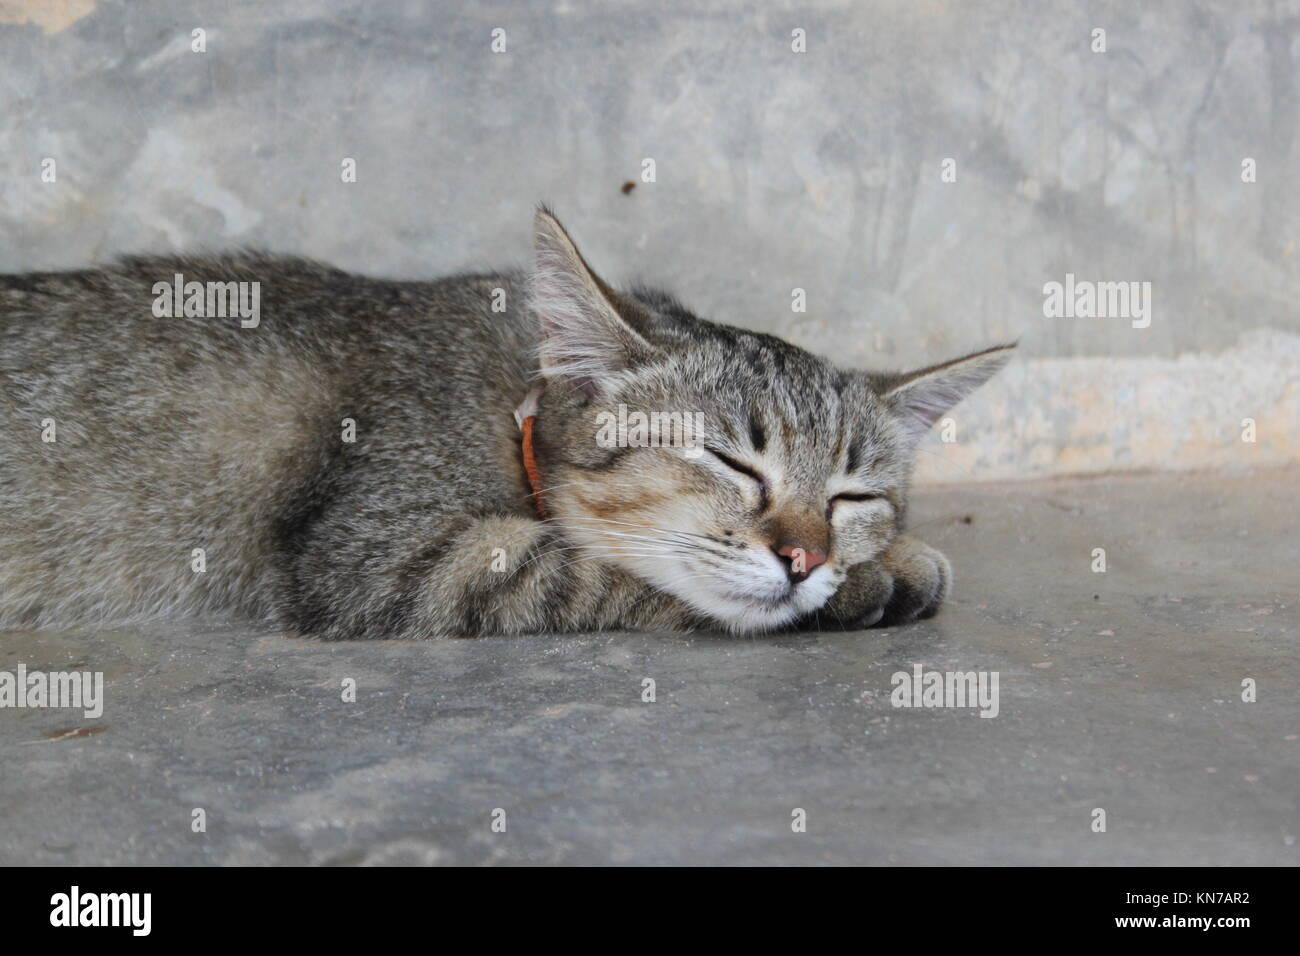 Cat from Lanta Animal Welfare on Koh Lanta, Thailand. - Stock Image